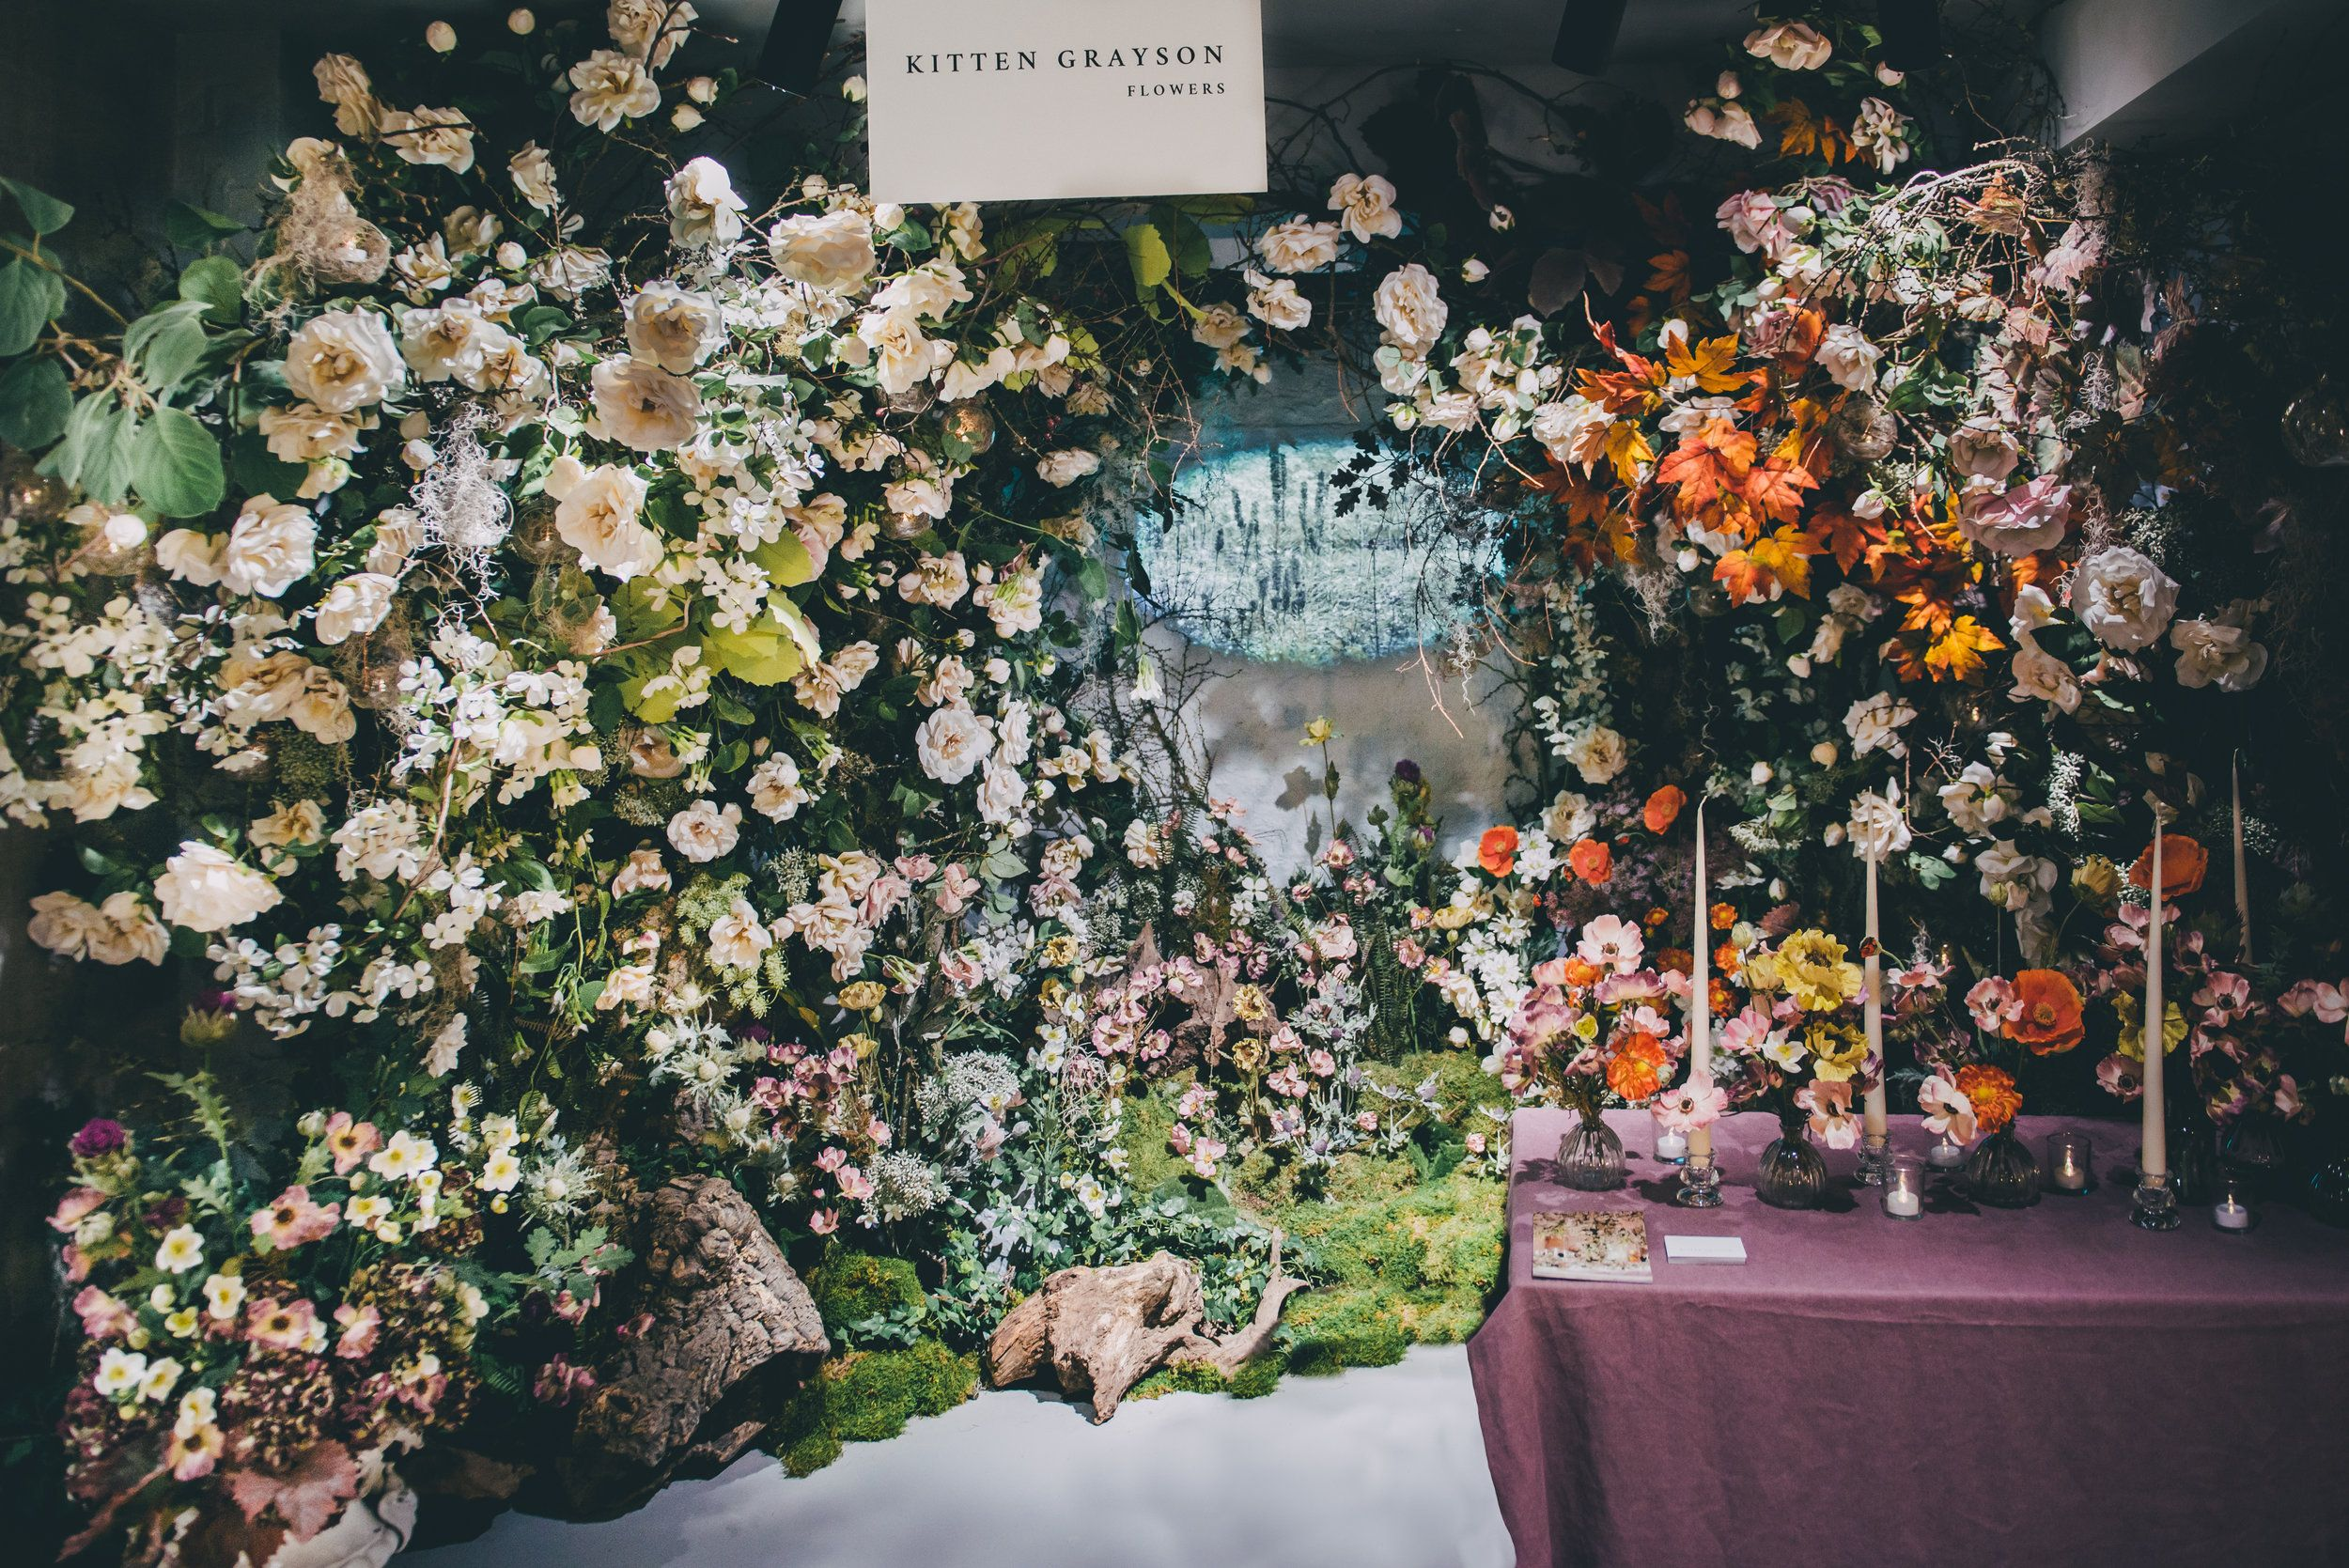 Kitten Grayson Flowers Flowers Holiday Decor Florist